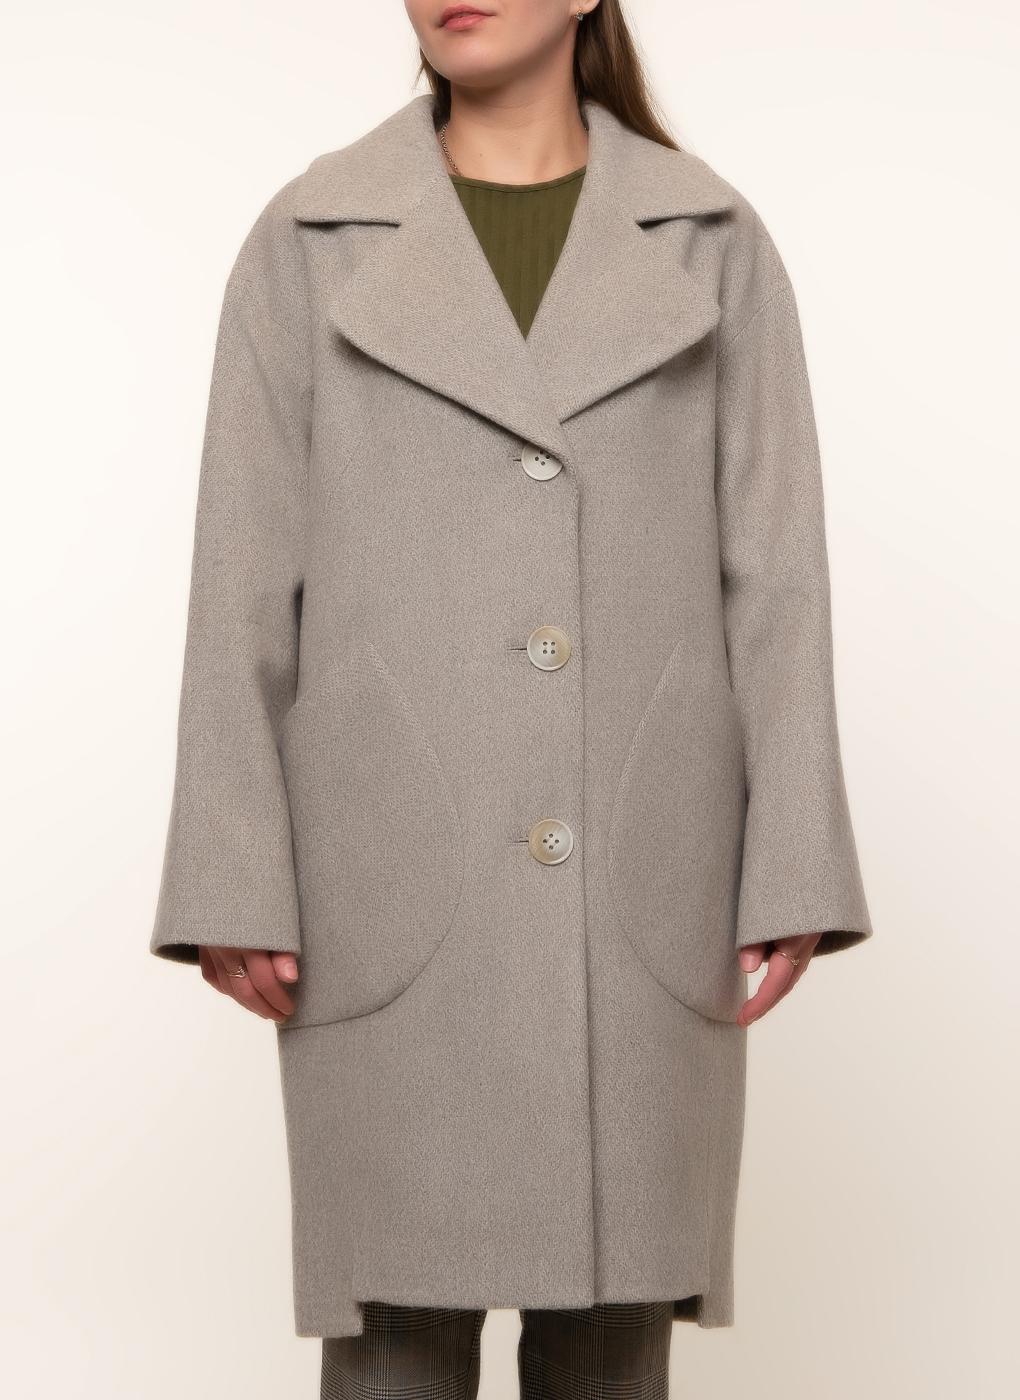 Пальто шерстяное 41, Gamelia experience фото